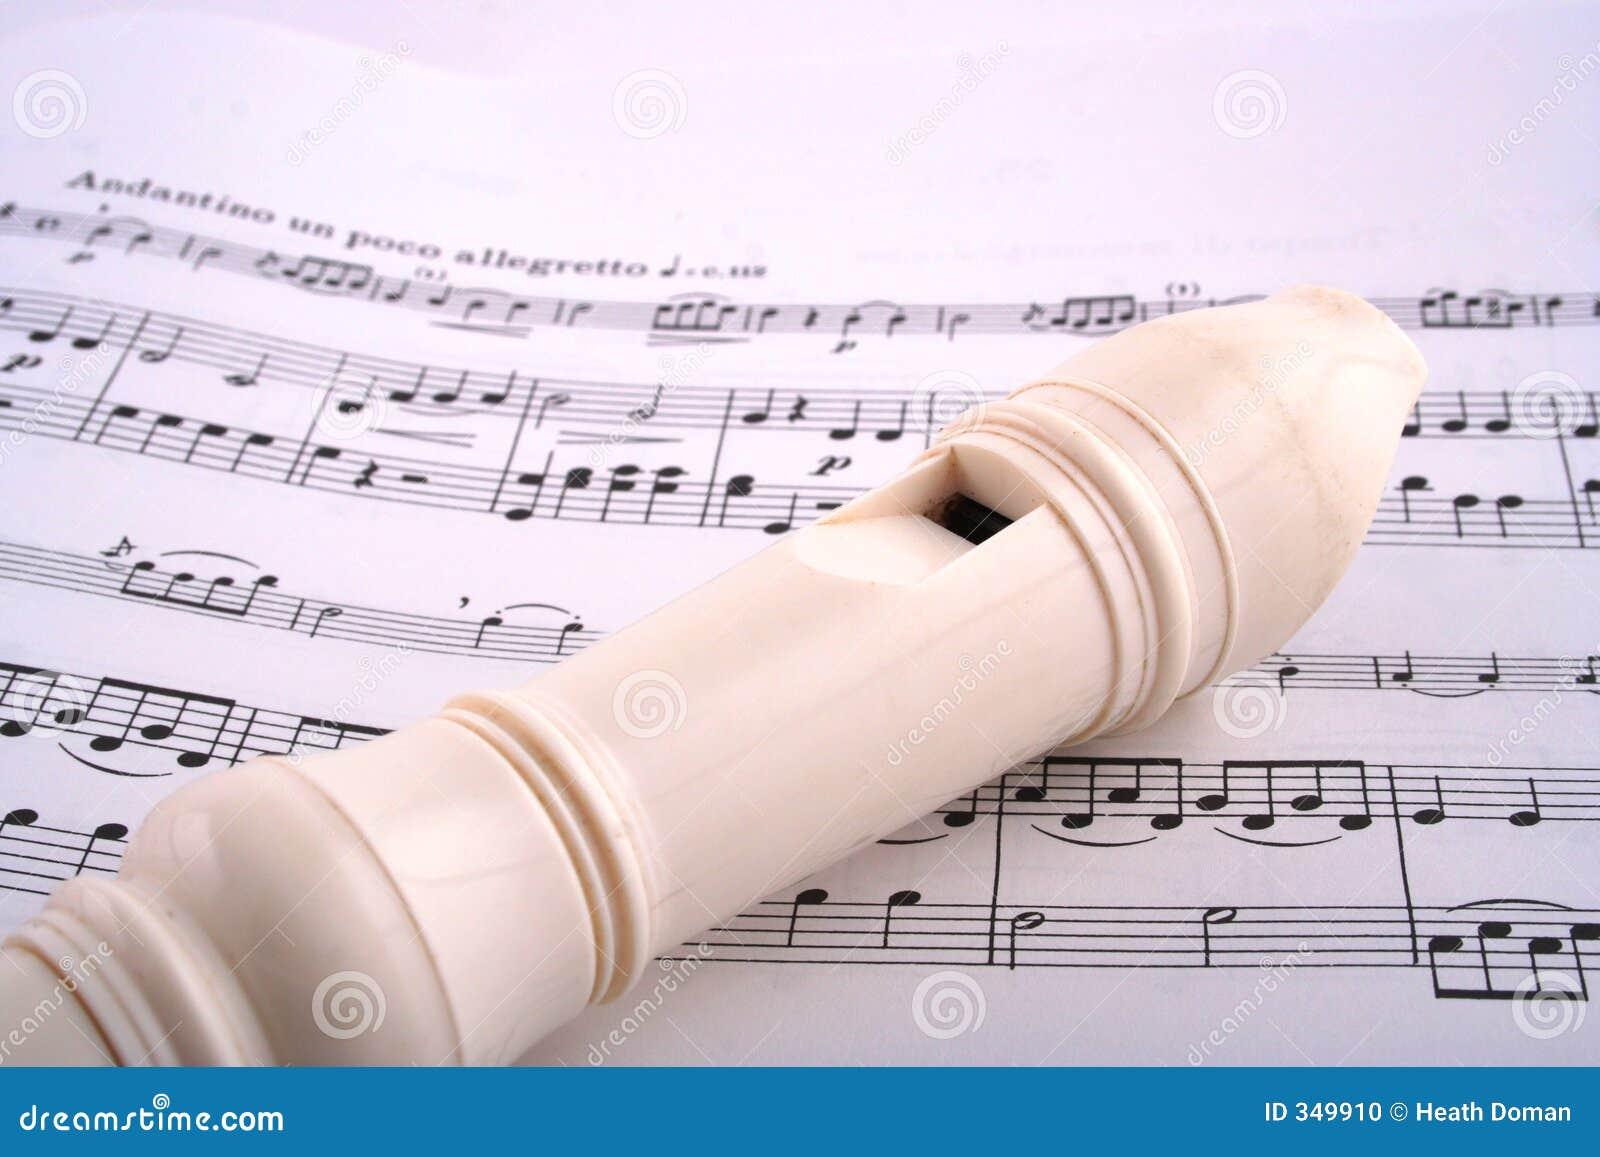 Recorder on sheet music